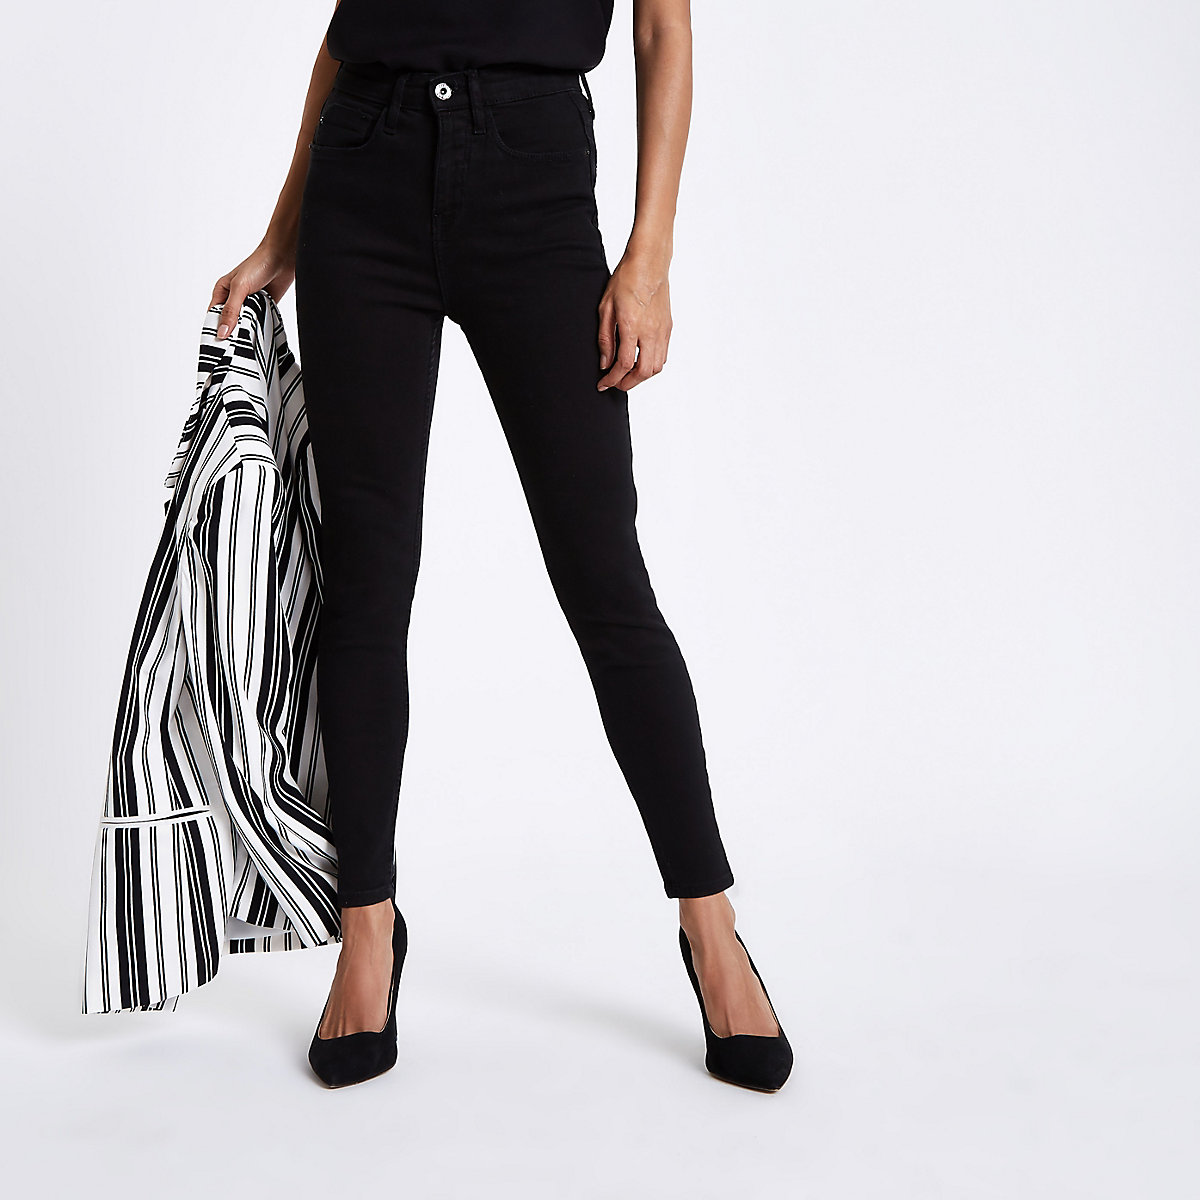 RI Petite - Harper - Zwarte skinny jeans met hoge taille